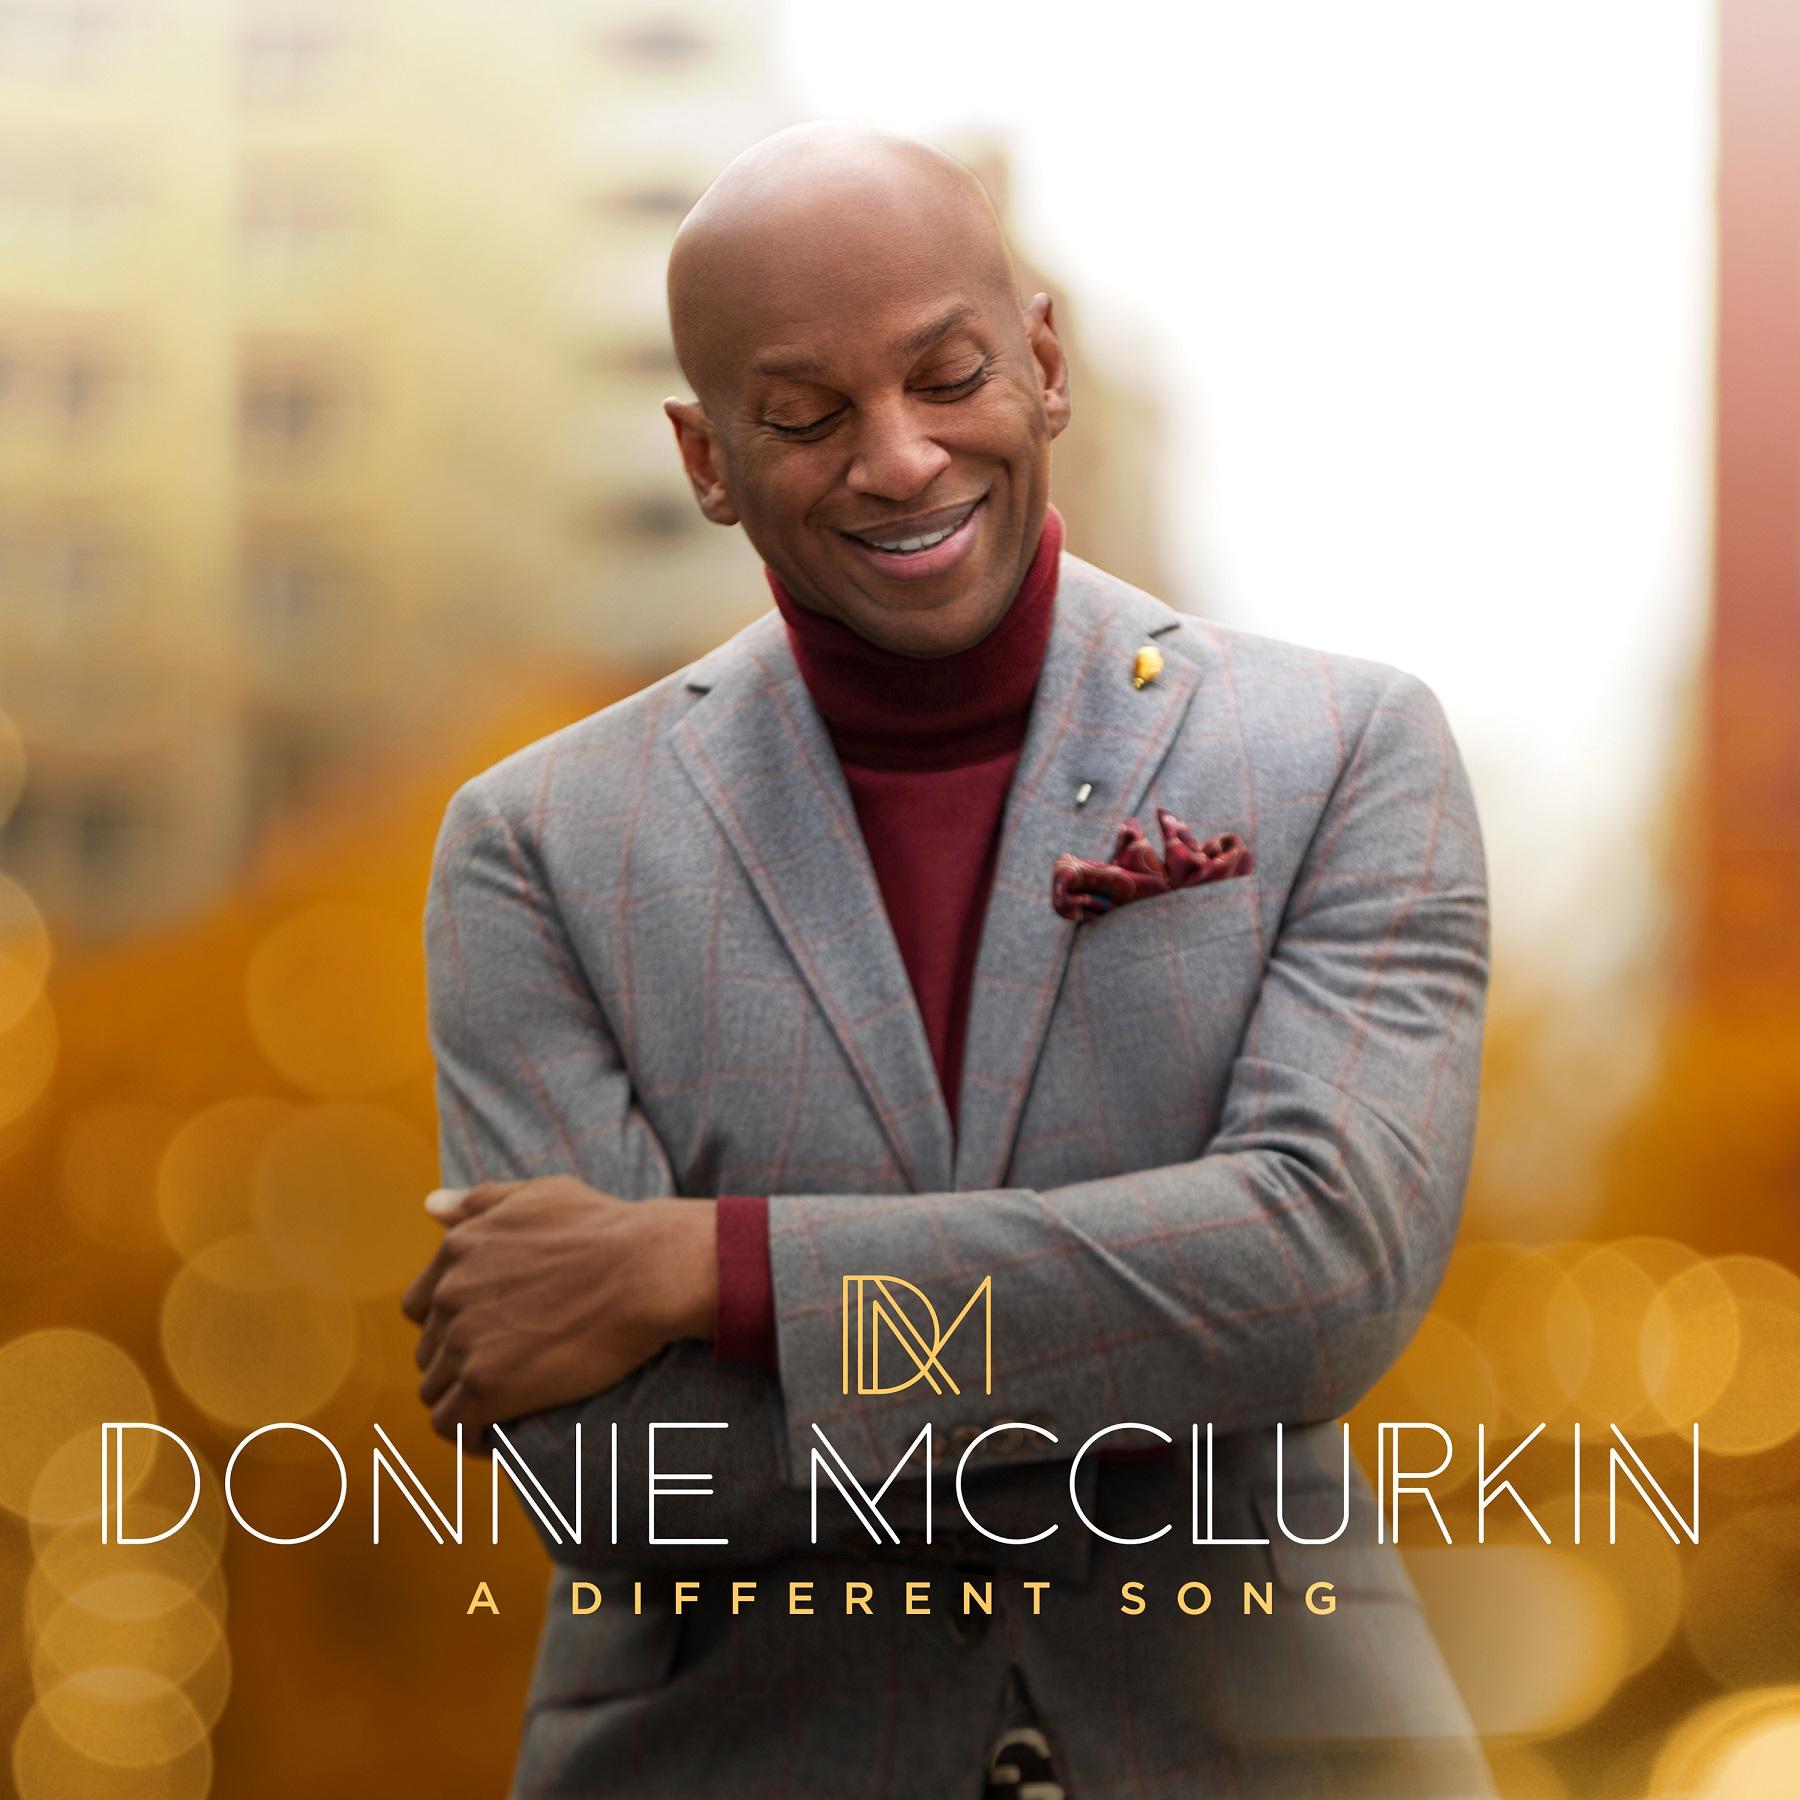 Donnie-McClurkin-A-Different-Song-Album_cover-art